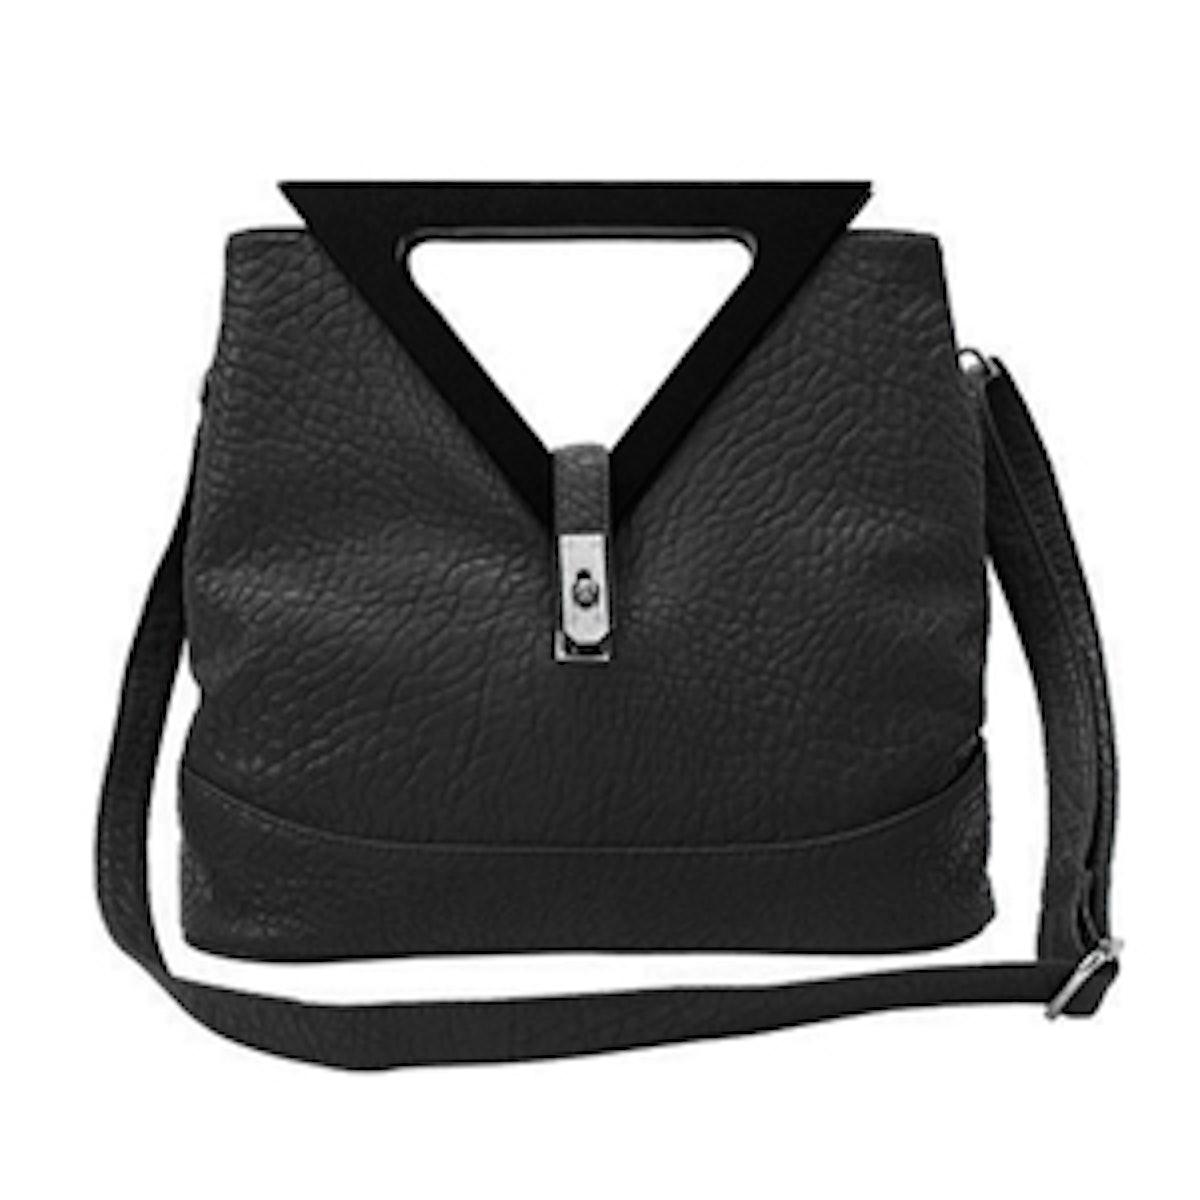 Triangle Handle Bag